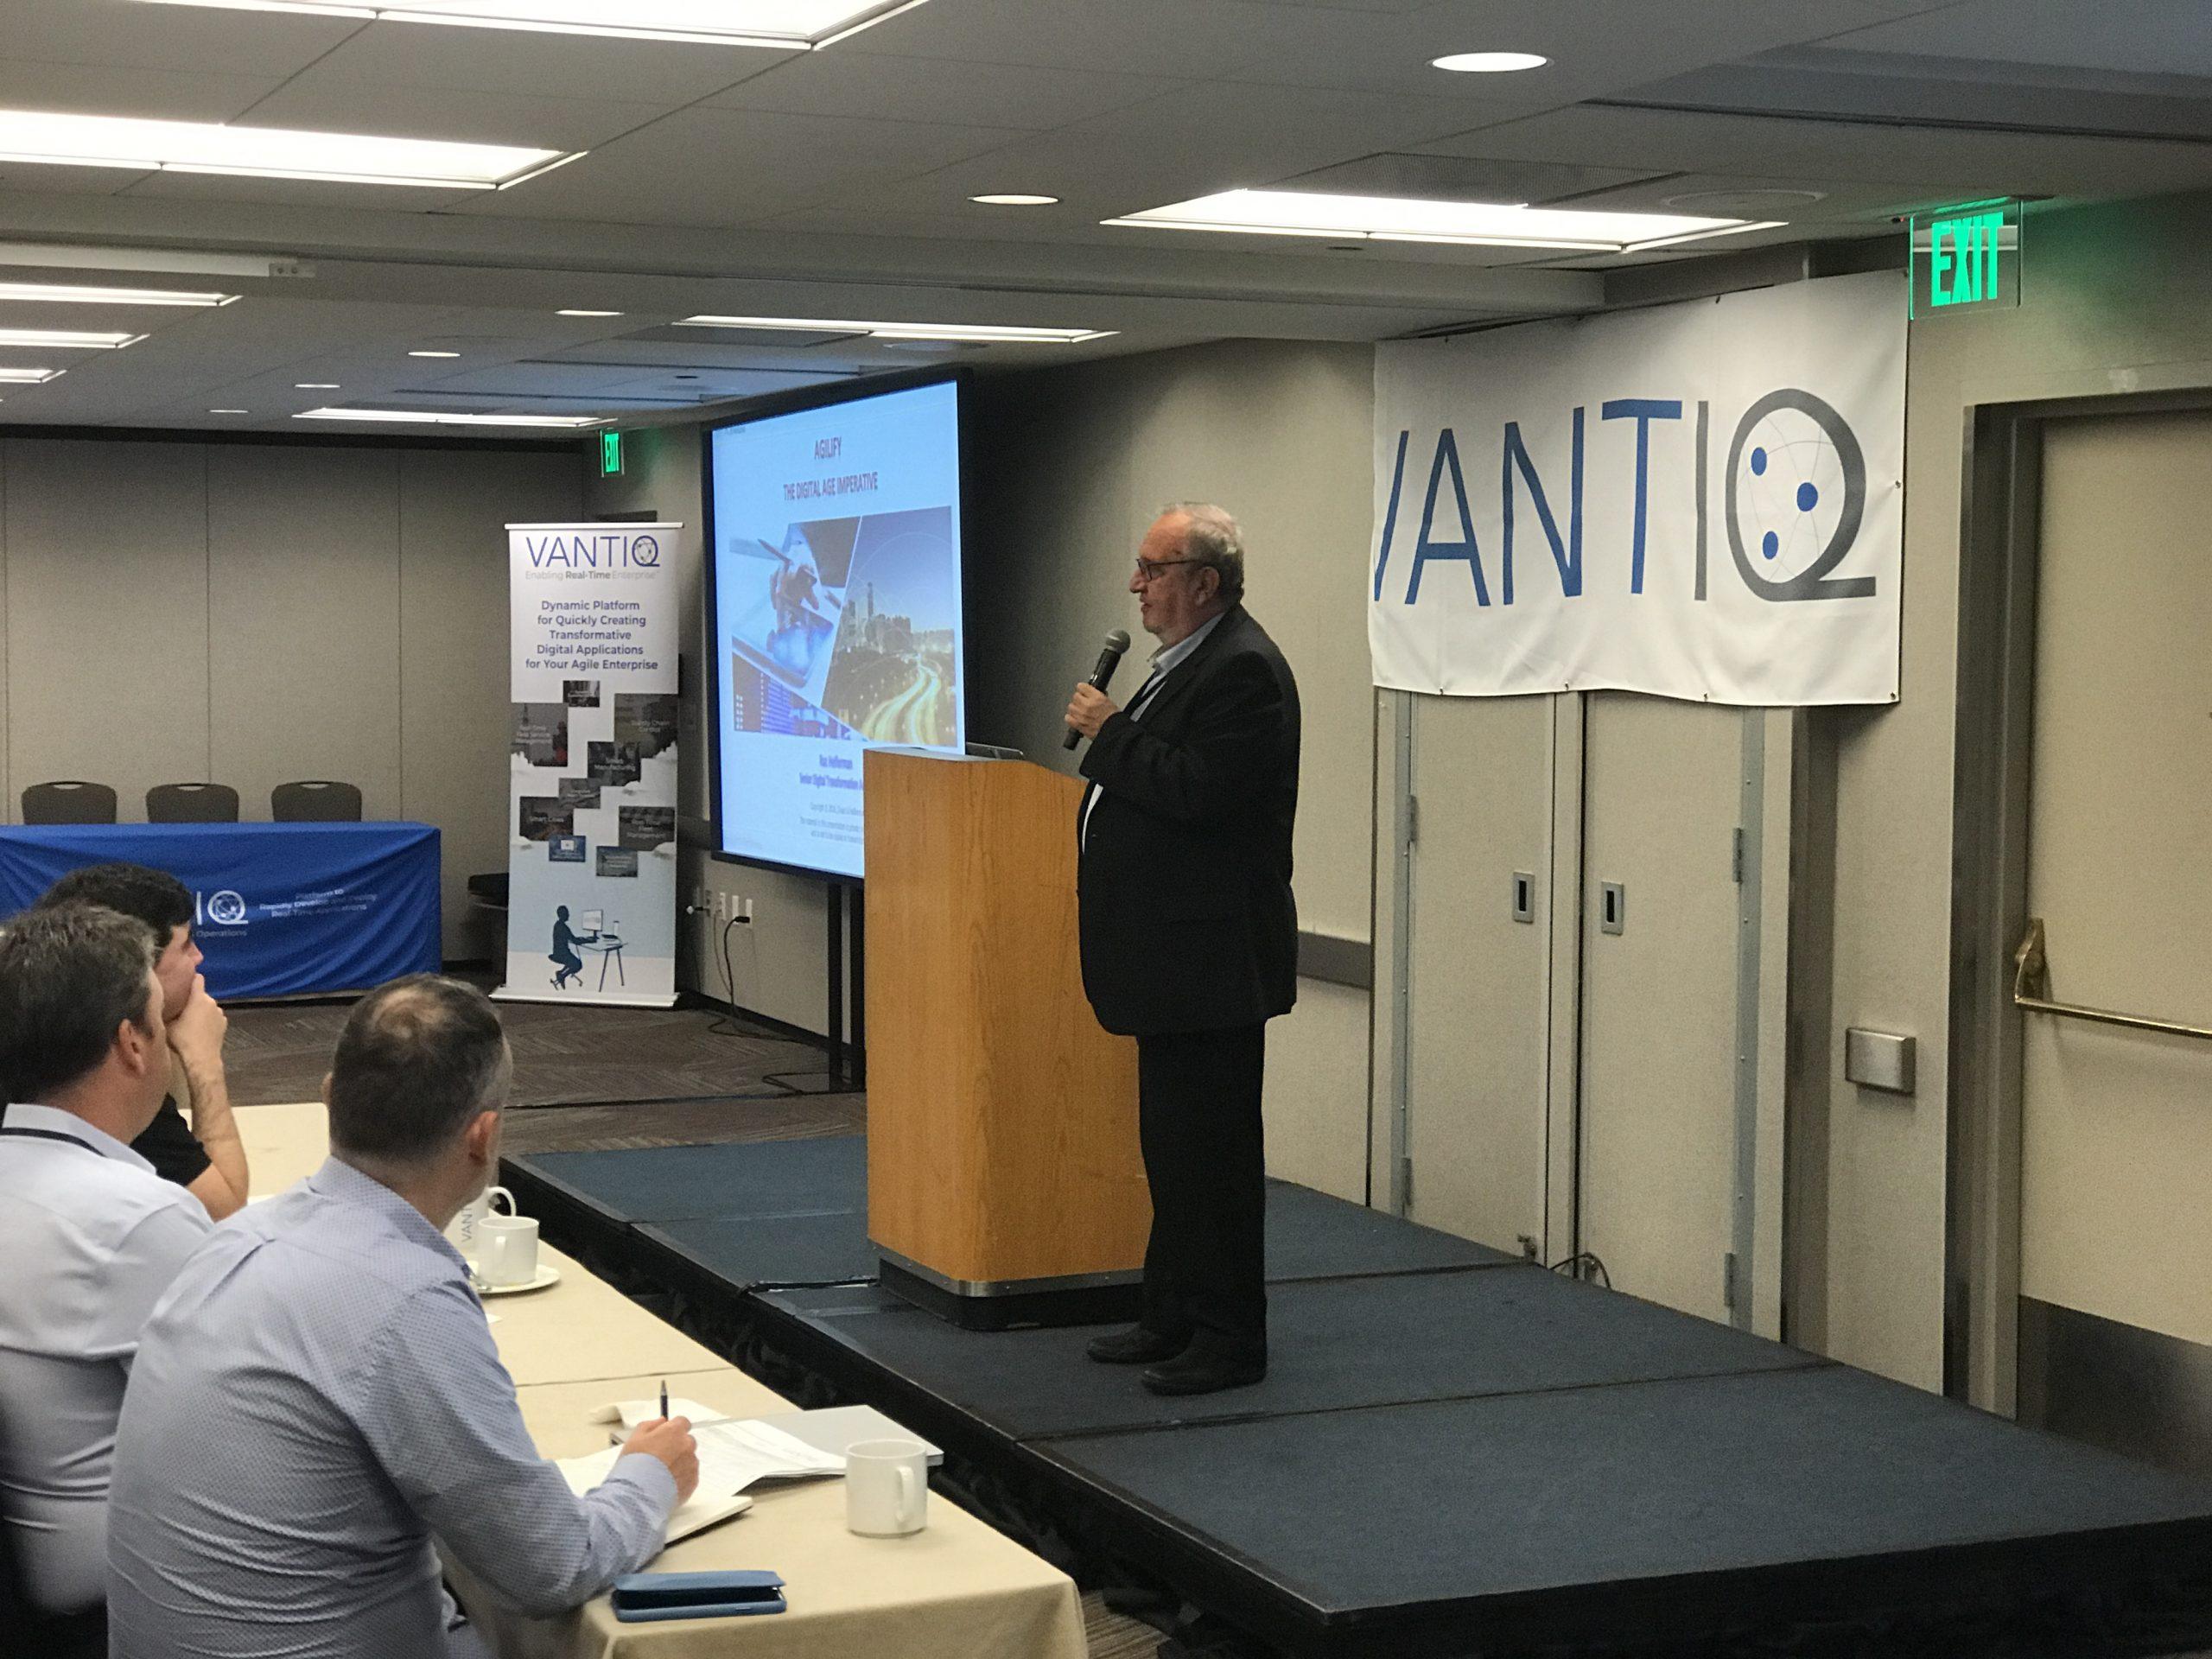 Digital Transformation Guru Raz Heiferman give speech about '4 Forces Feamwork for Agilification' at 2018 VANTIQ Global Partner Summit in San Francisco